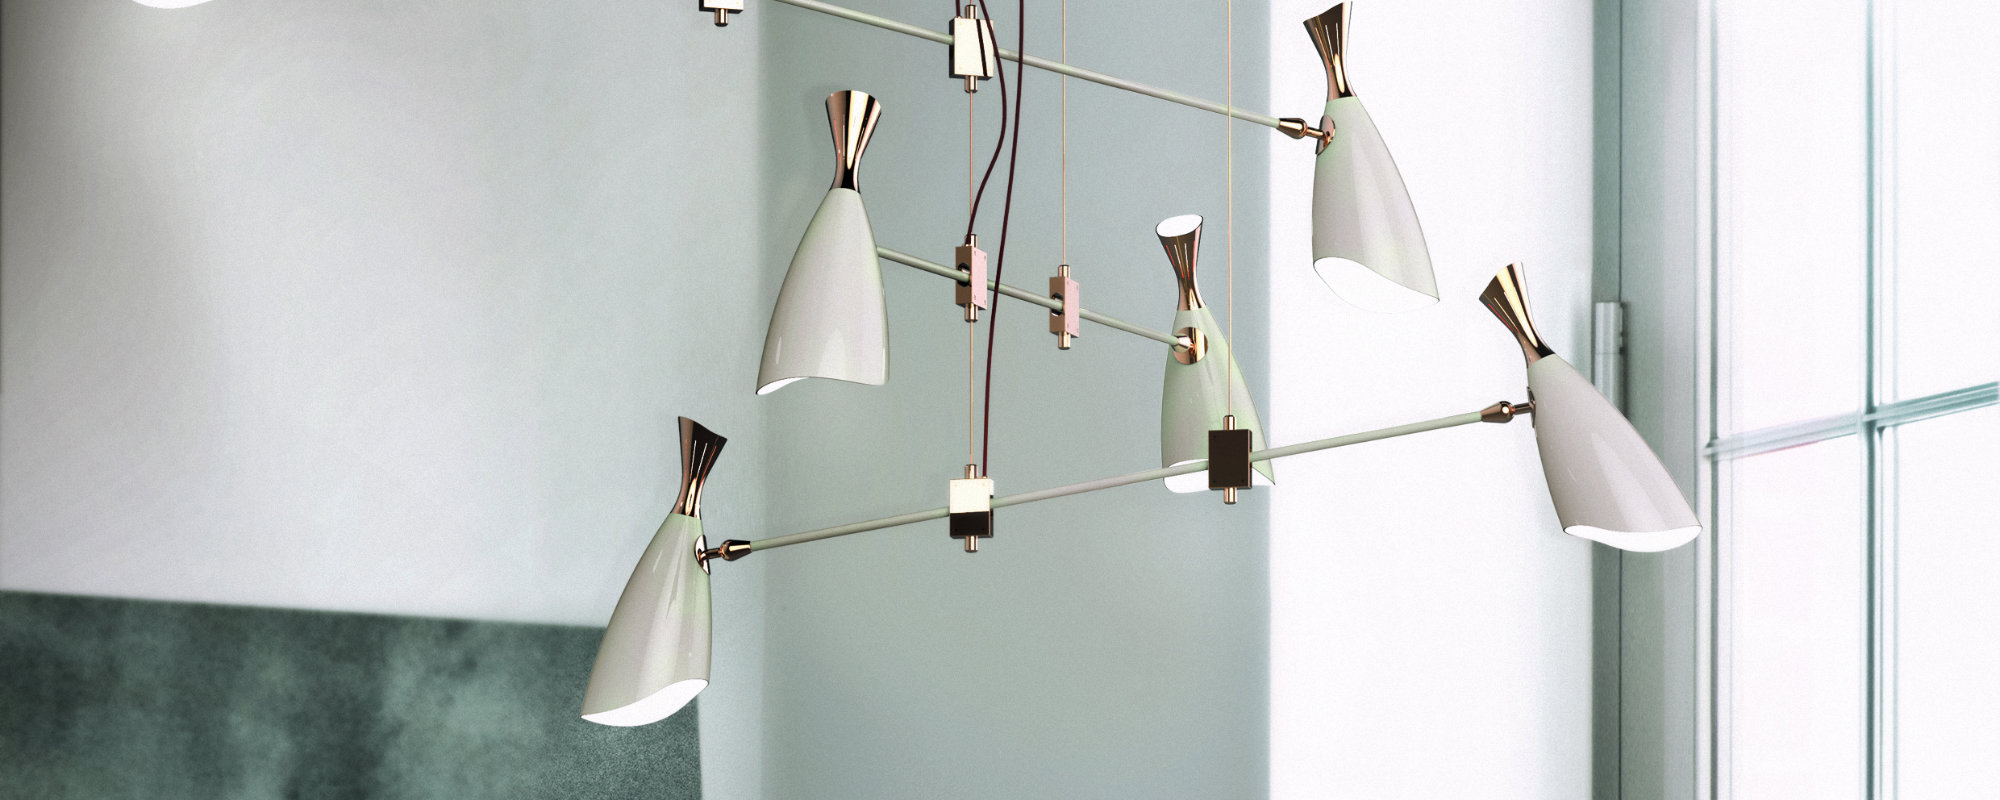 Ideas para Decorar: Lámparas de teto blancas para un hogar de lujo  Ideas para Decorar: Lámparas de teto blancas para un hogar de lujo FEATURED